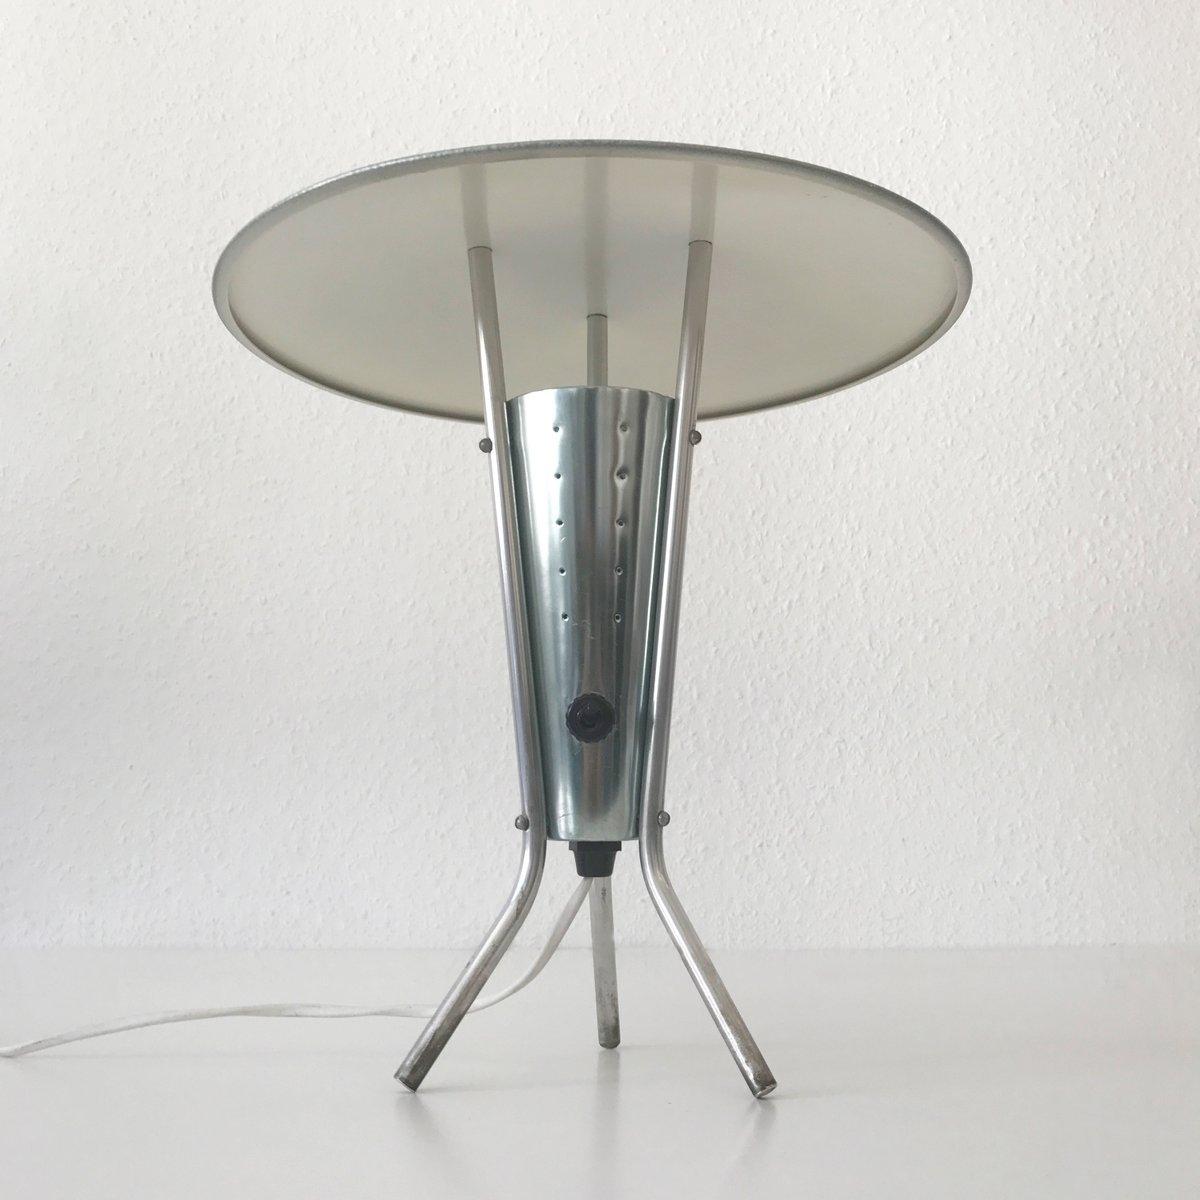 Mid-Century Modern Sputnik Tischlampe, 1950er